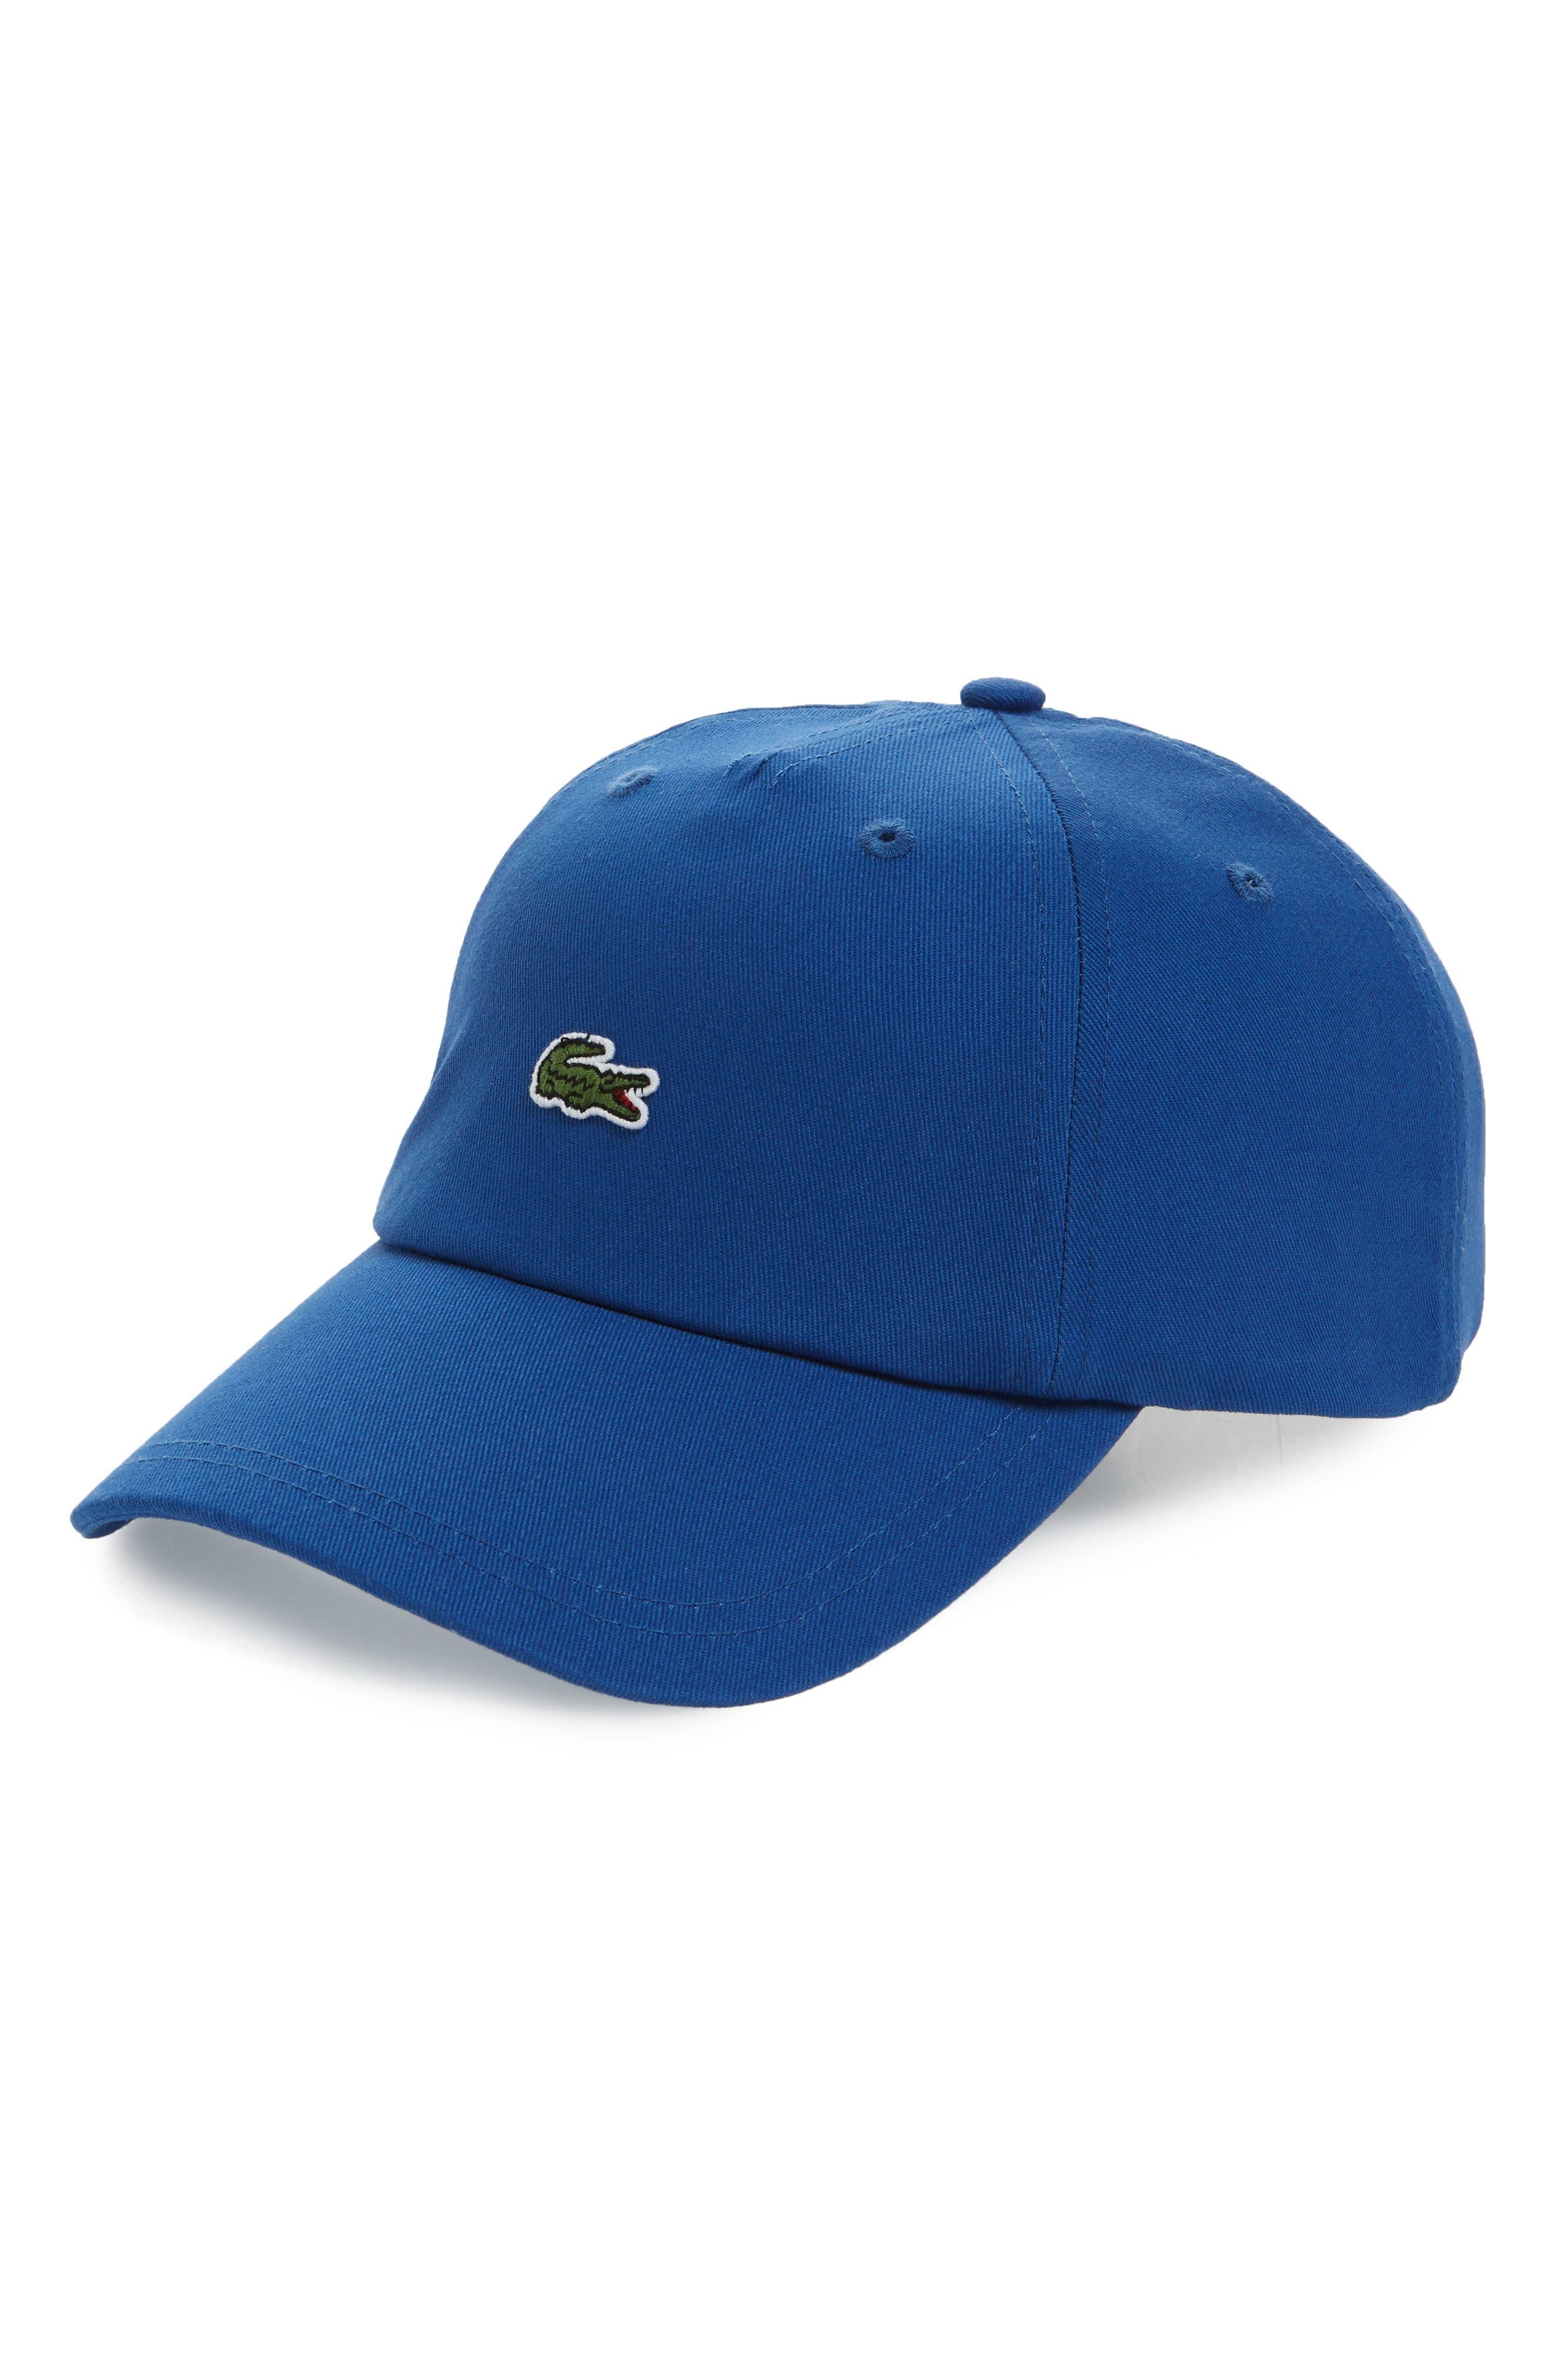 Main Image - Lacoste Small Croc Baseball Cap